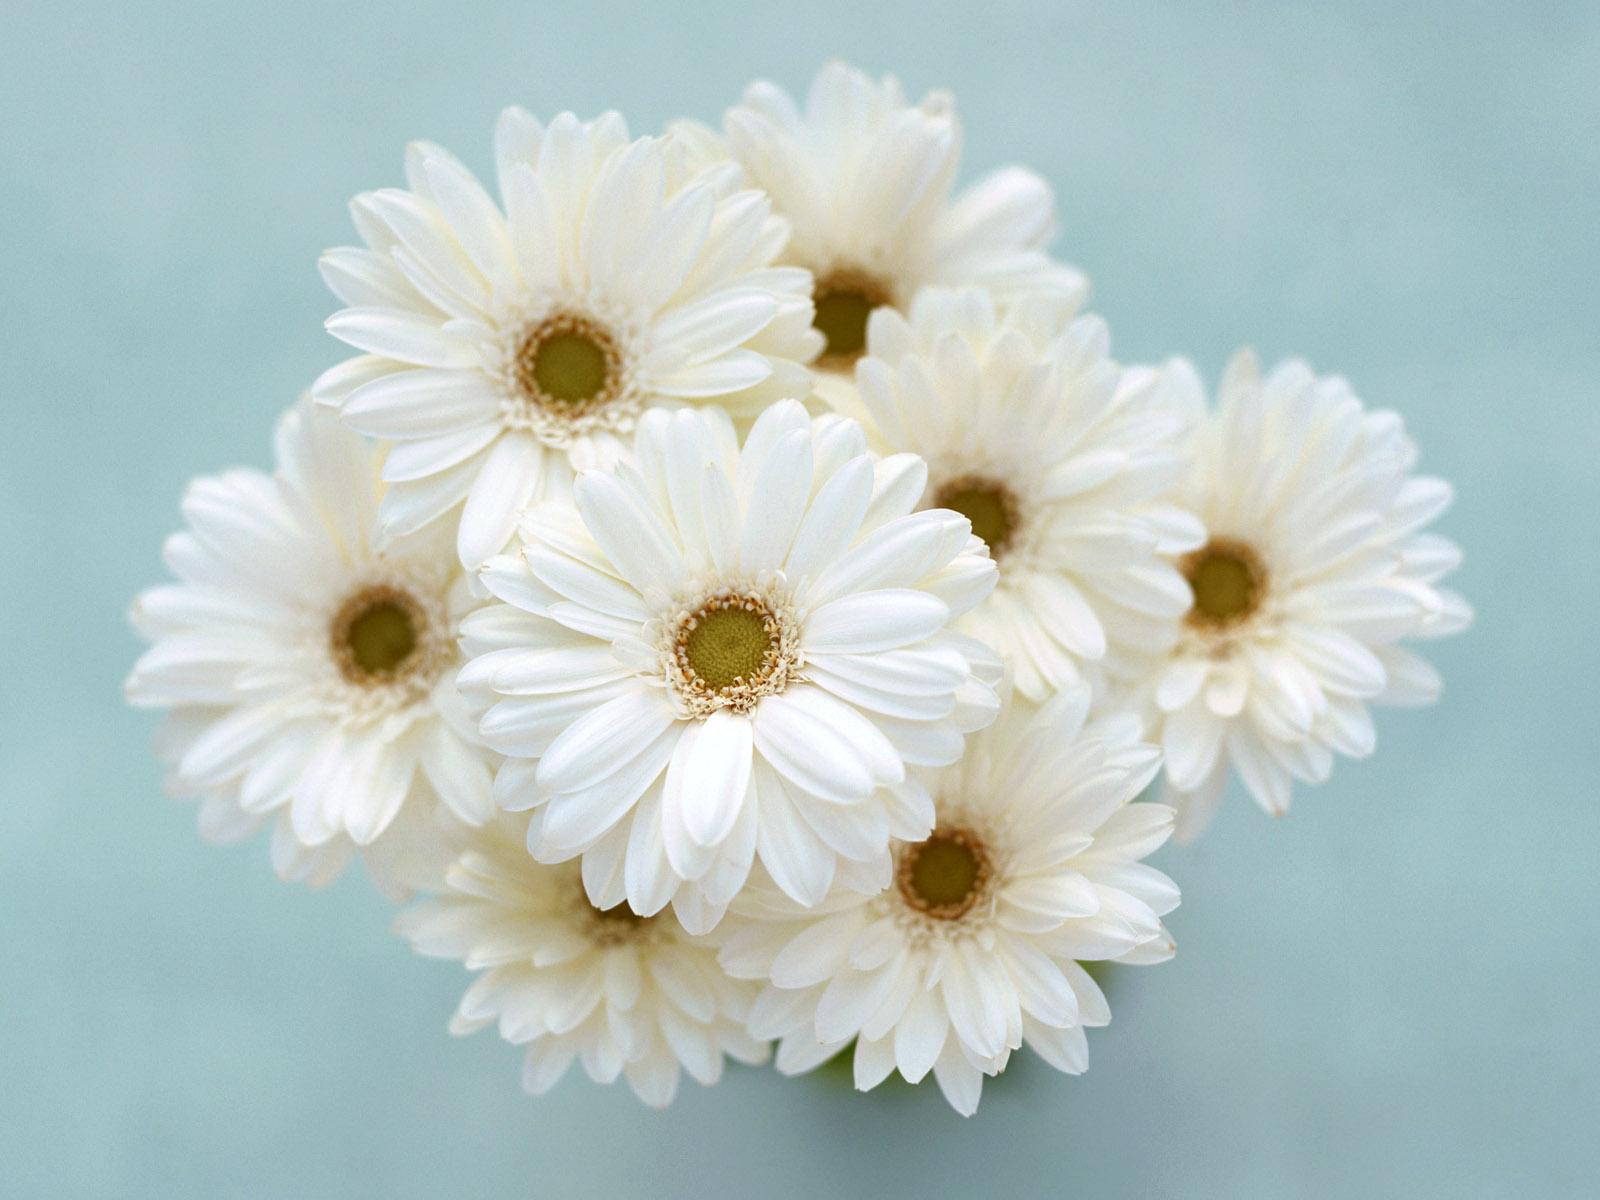 White Flowers 39943 1600x1200 px